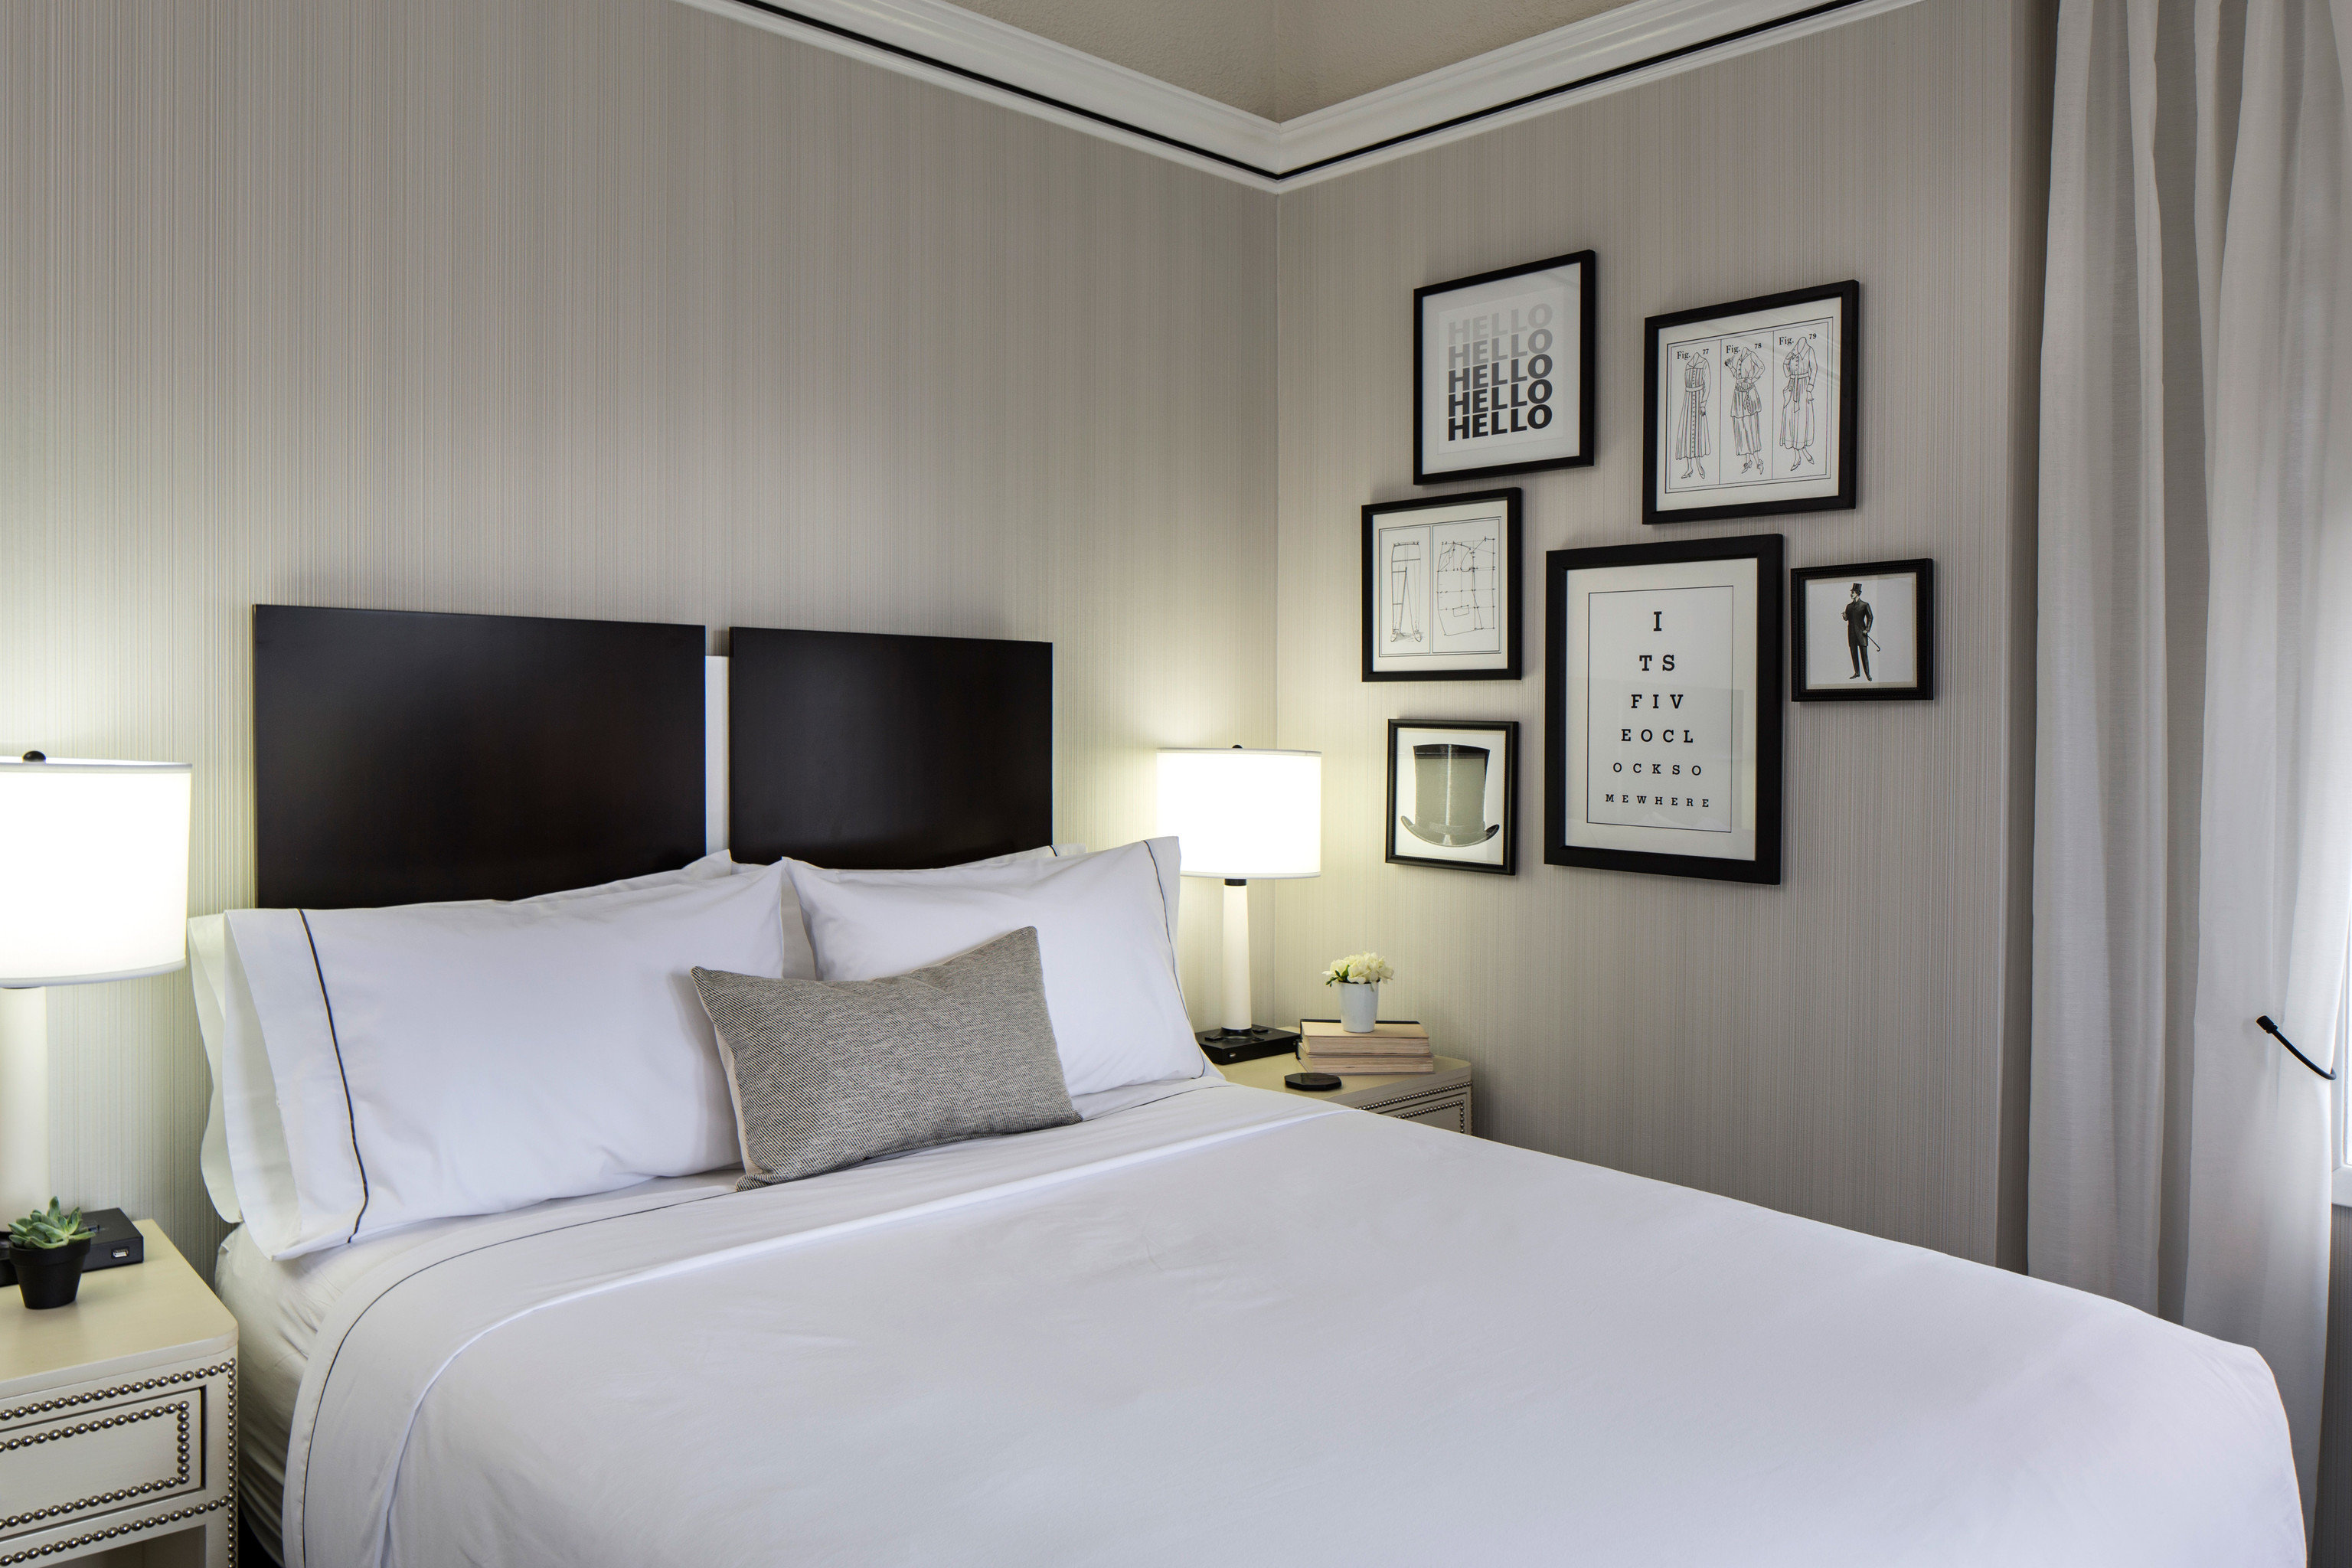 Bedroom property pillow scene white Suite home living room cottage condominium